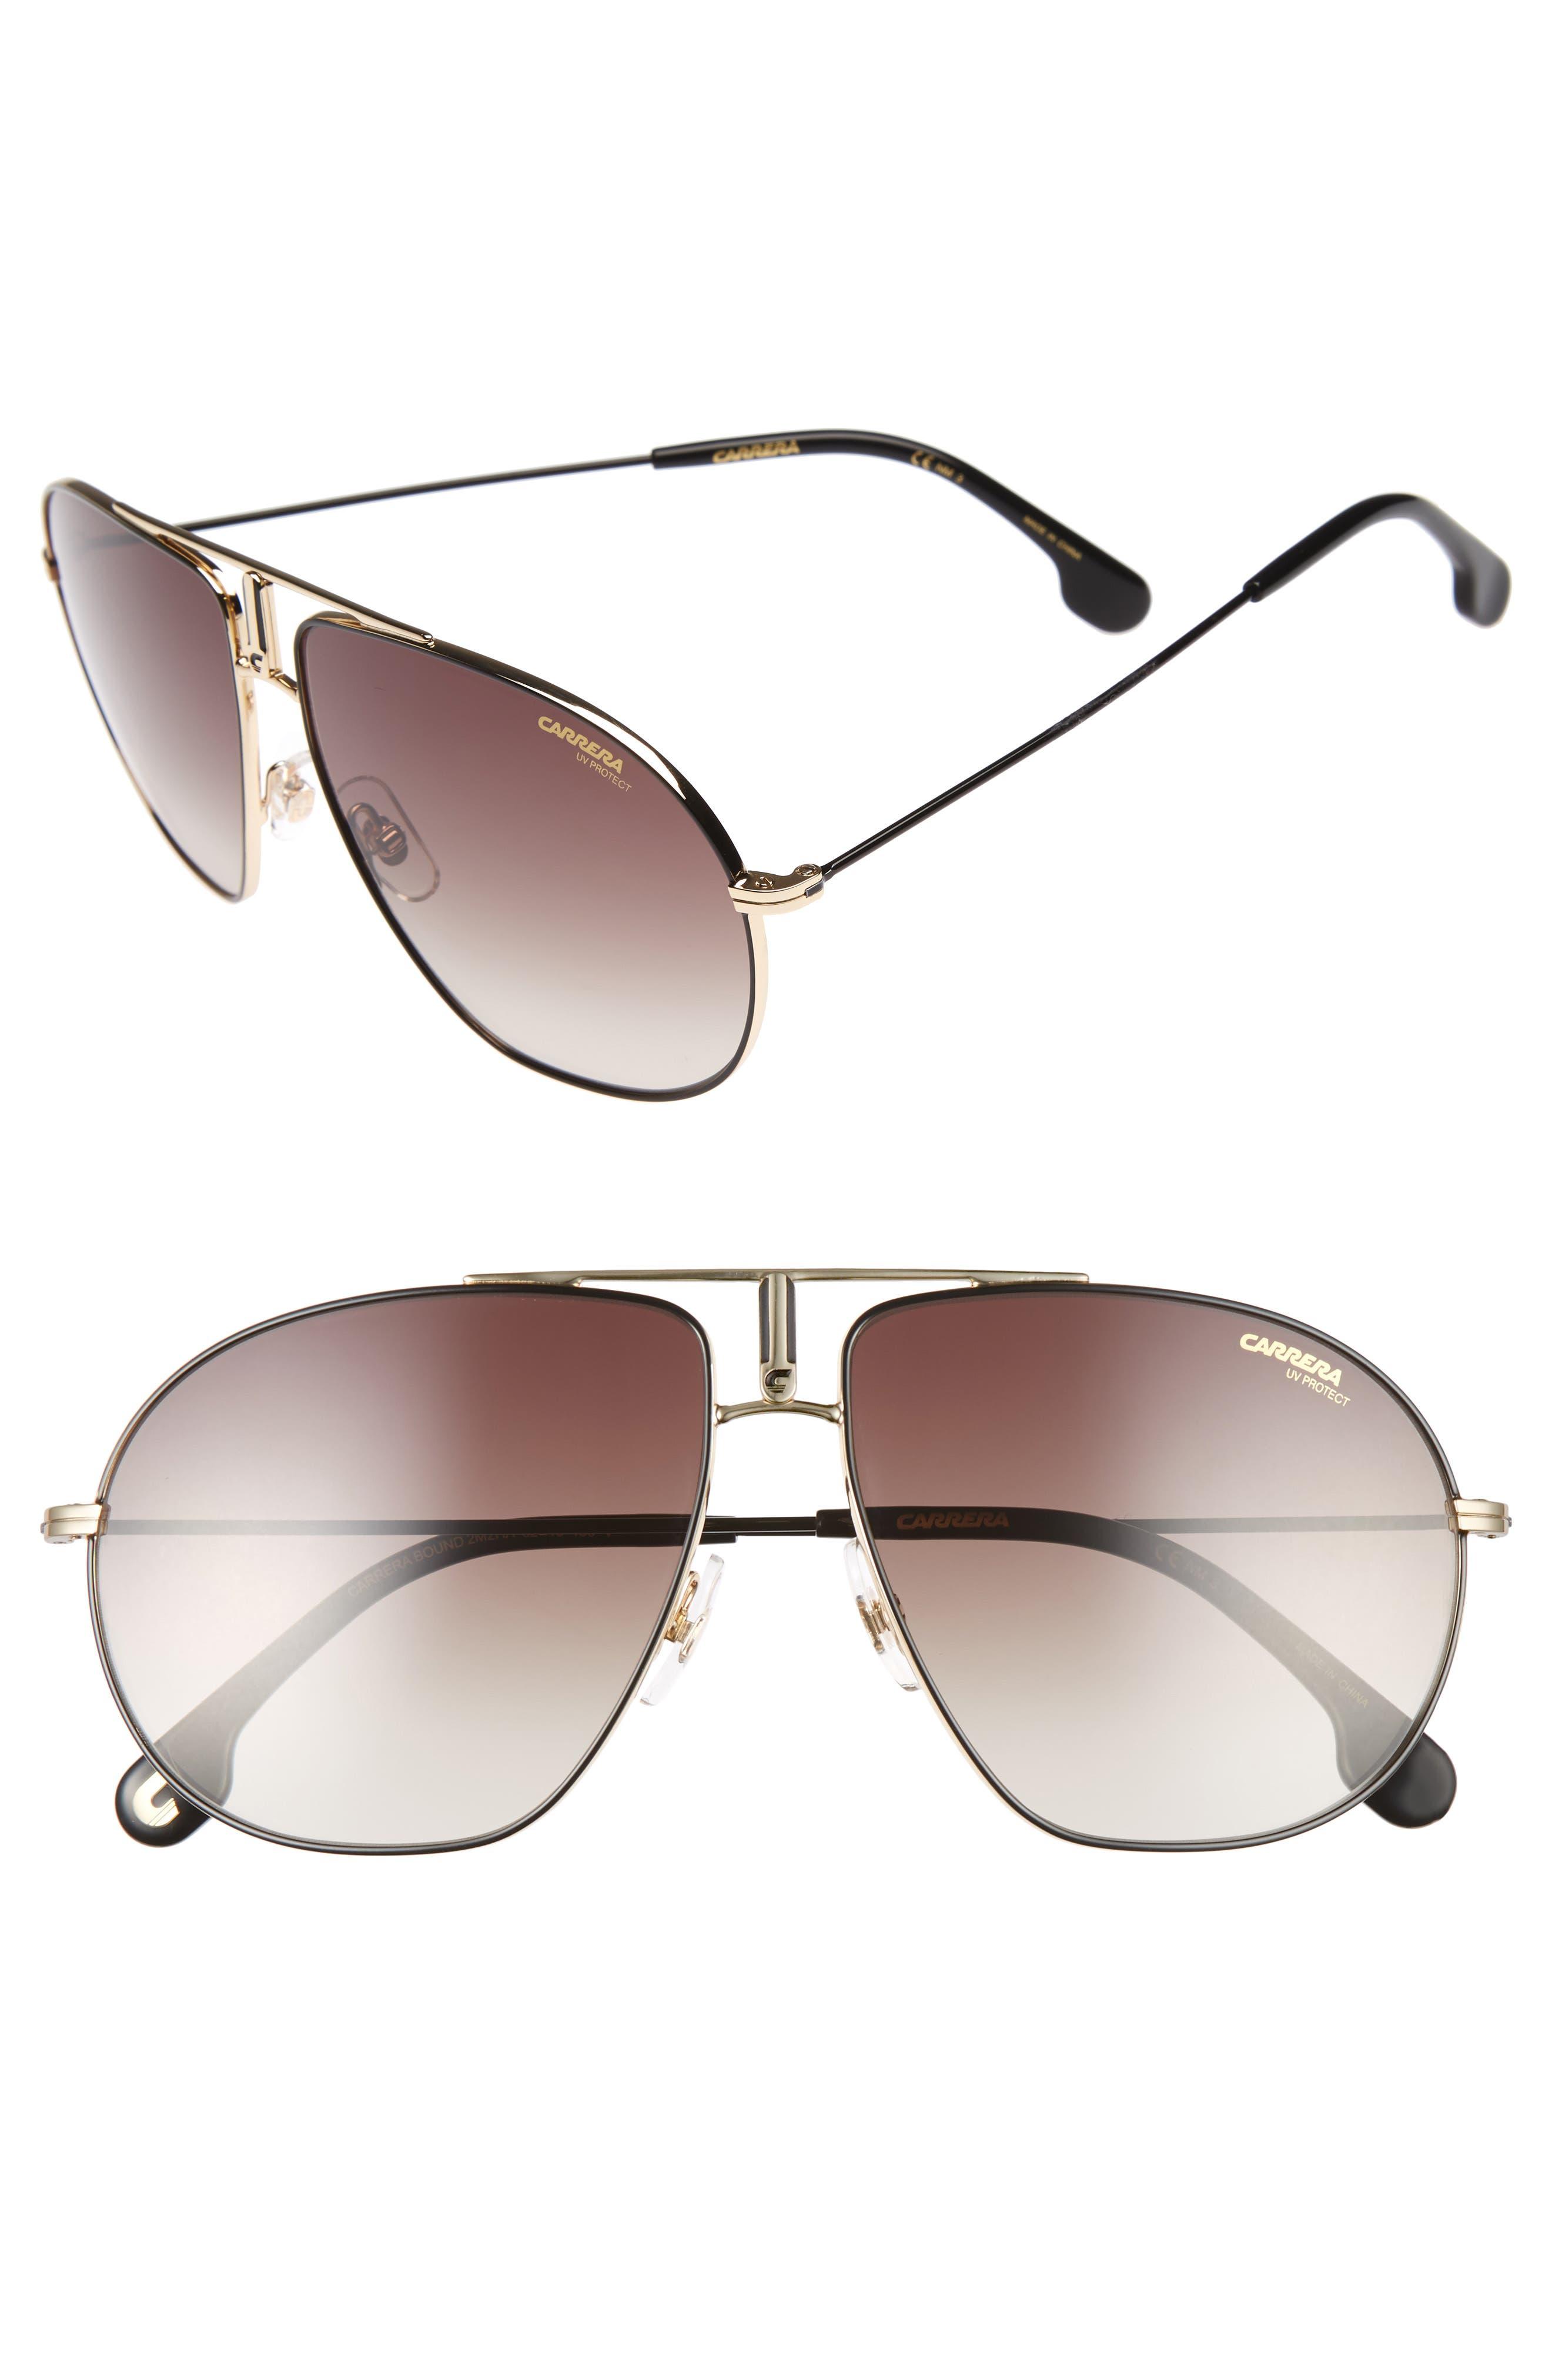 Carrera Bound 62mm Sunglasses,                             Main thumbnail 1, color,                             Black Gold